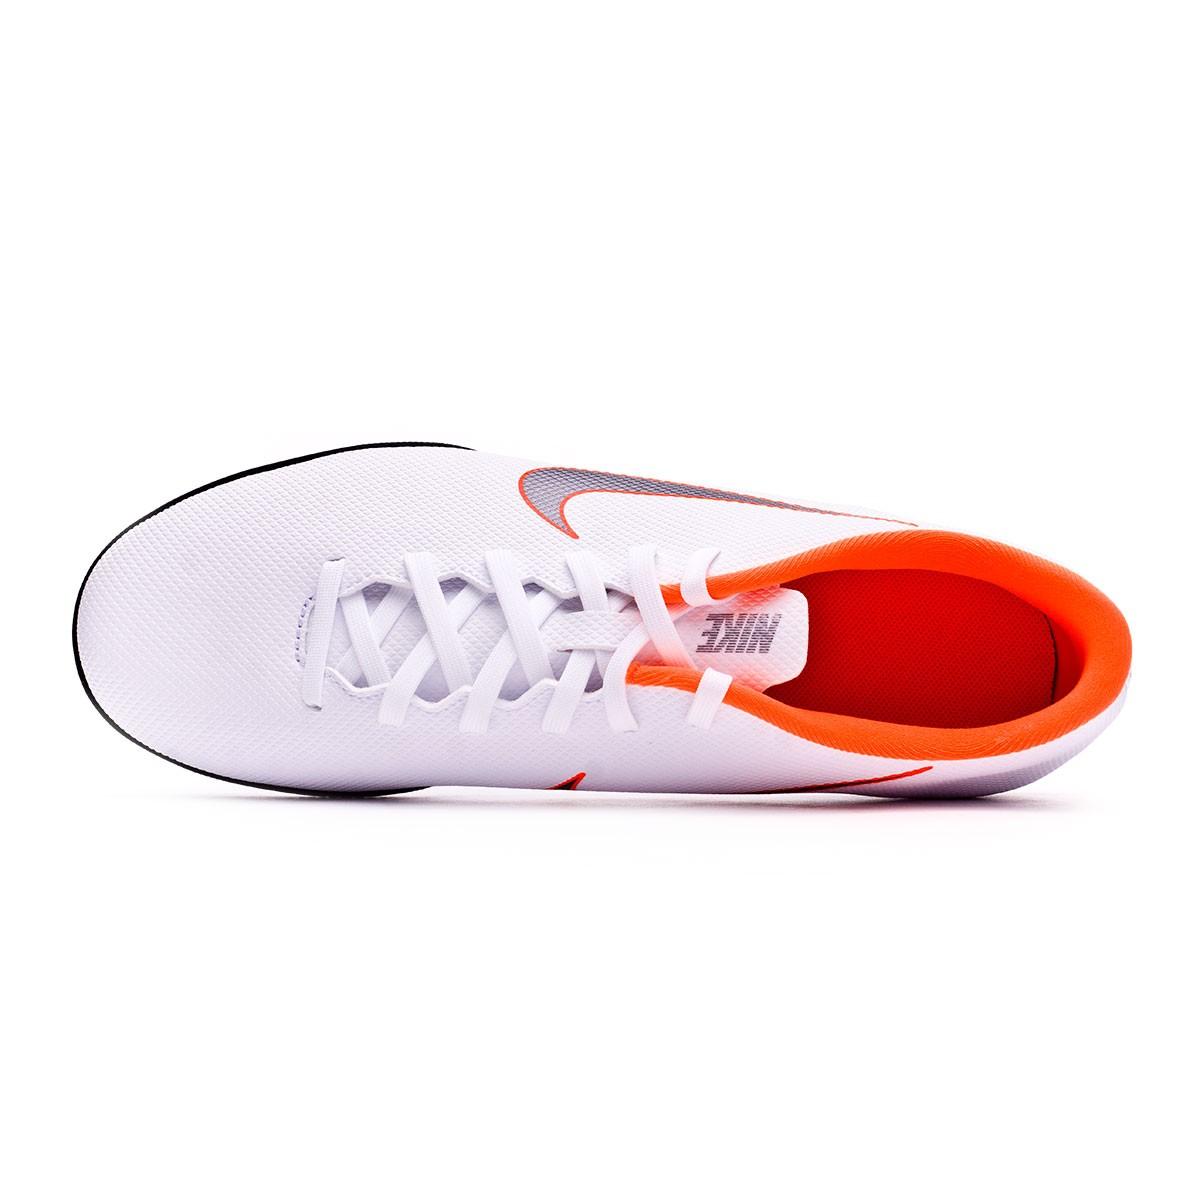 1c3107cdfd7 Futsal Boot Nike Mercurial VaporX XII Club IC White-Metallic cool  grey-Total orange - Football store Fútbol Emotion